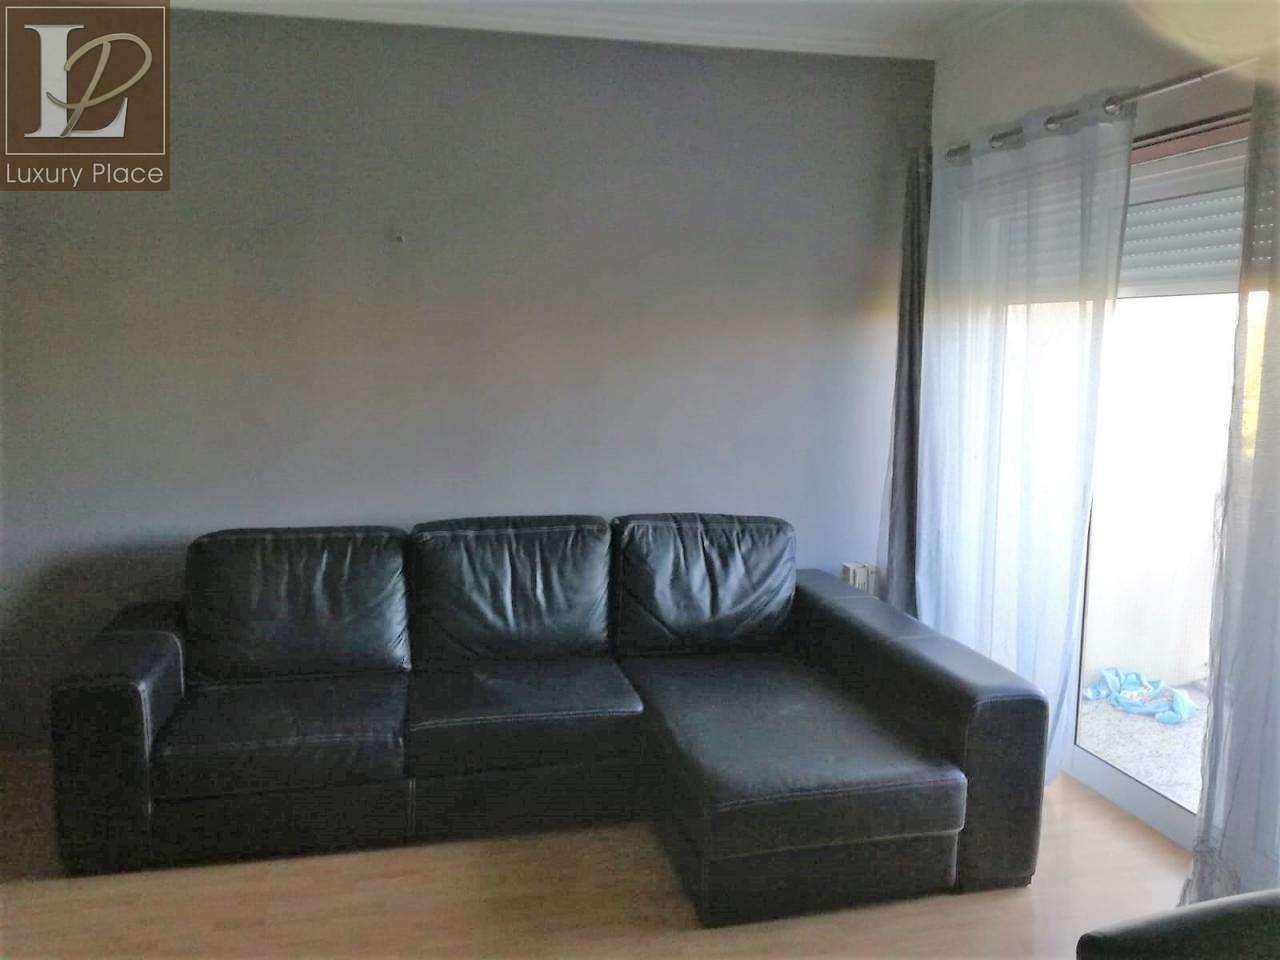 Apartamento para comprar, Odivelas, Lisboa - Foto 5